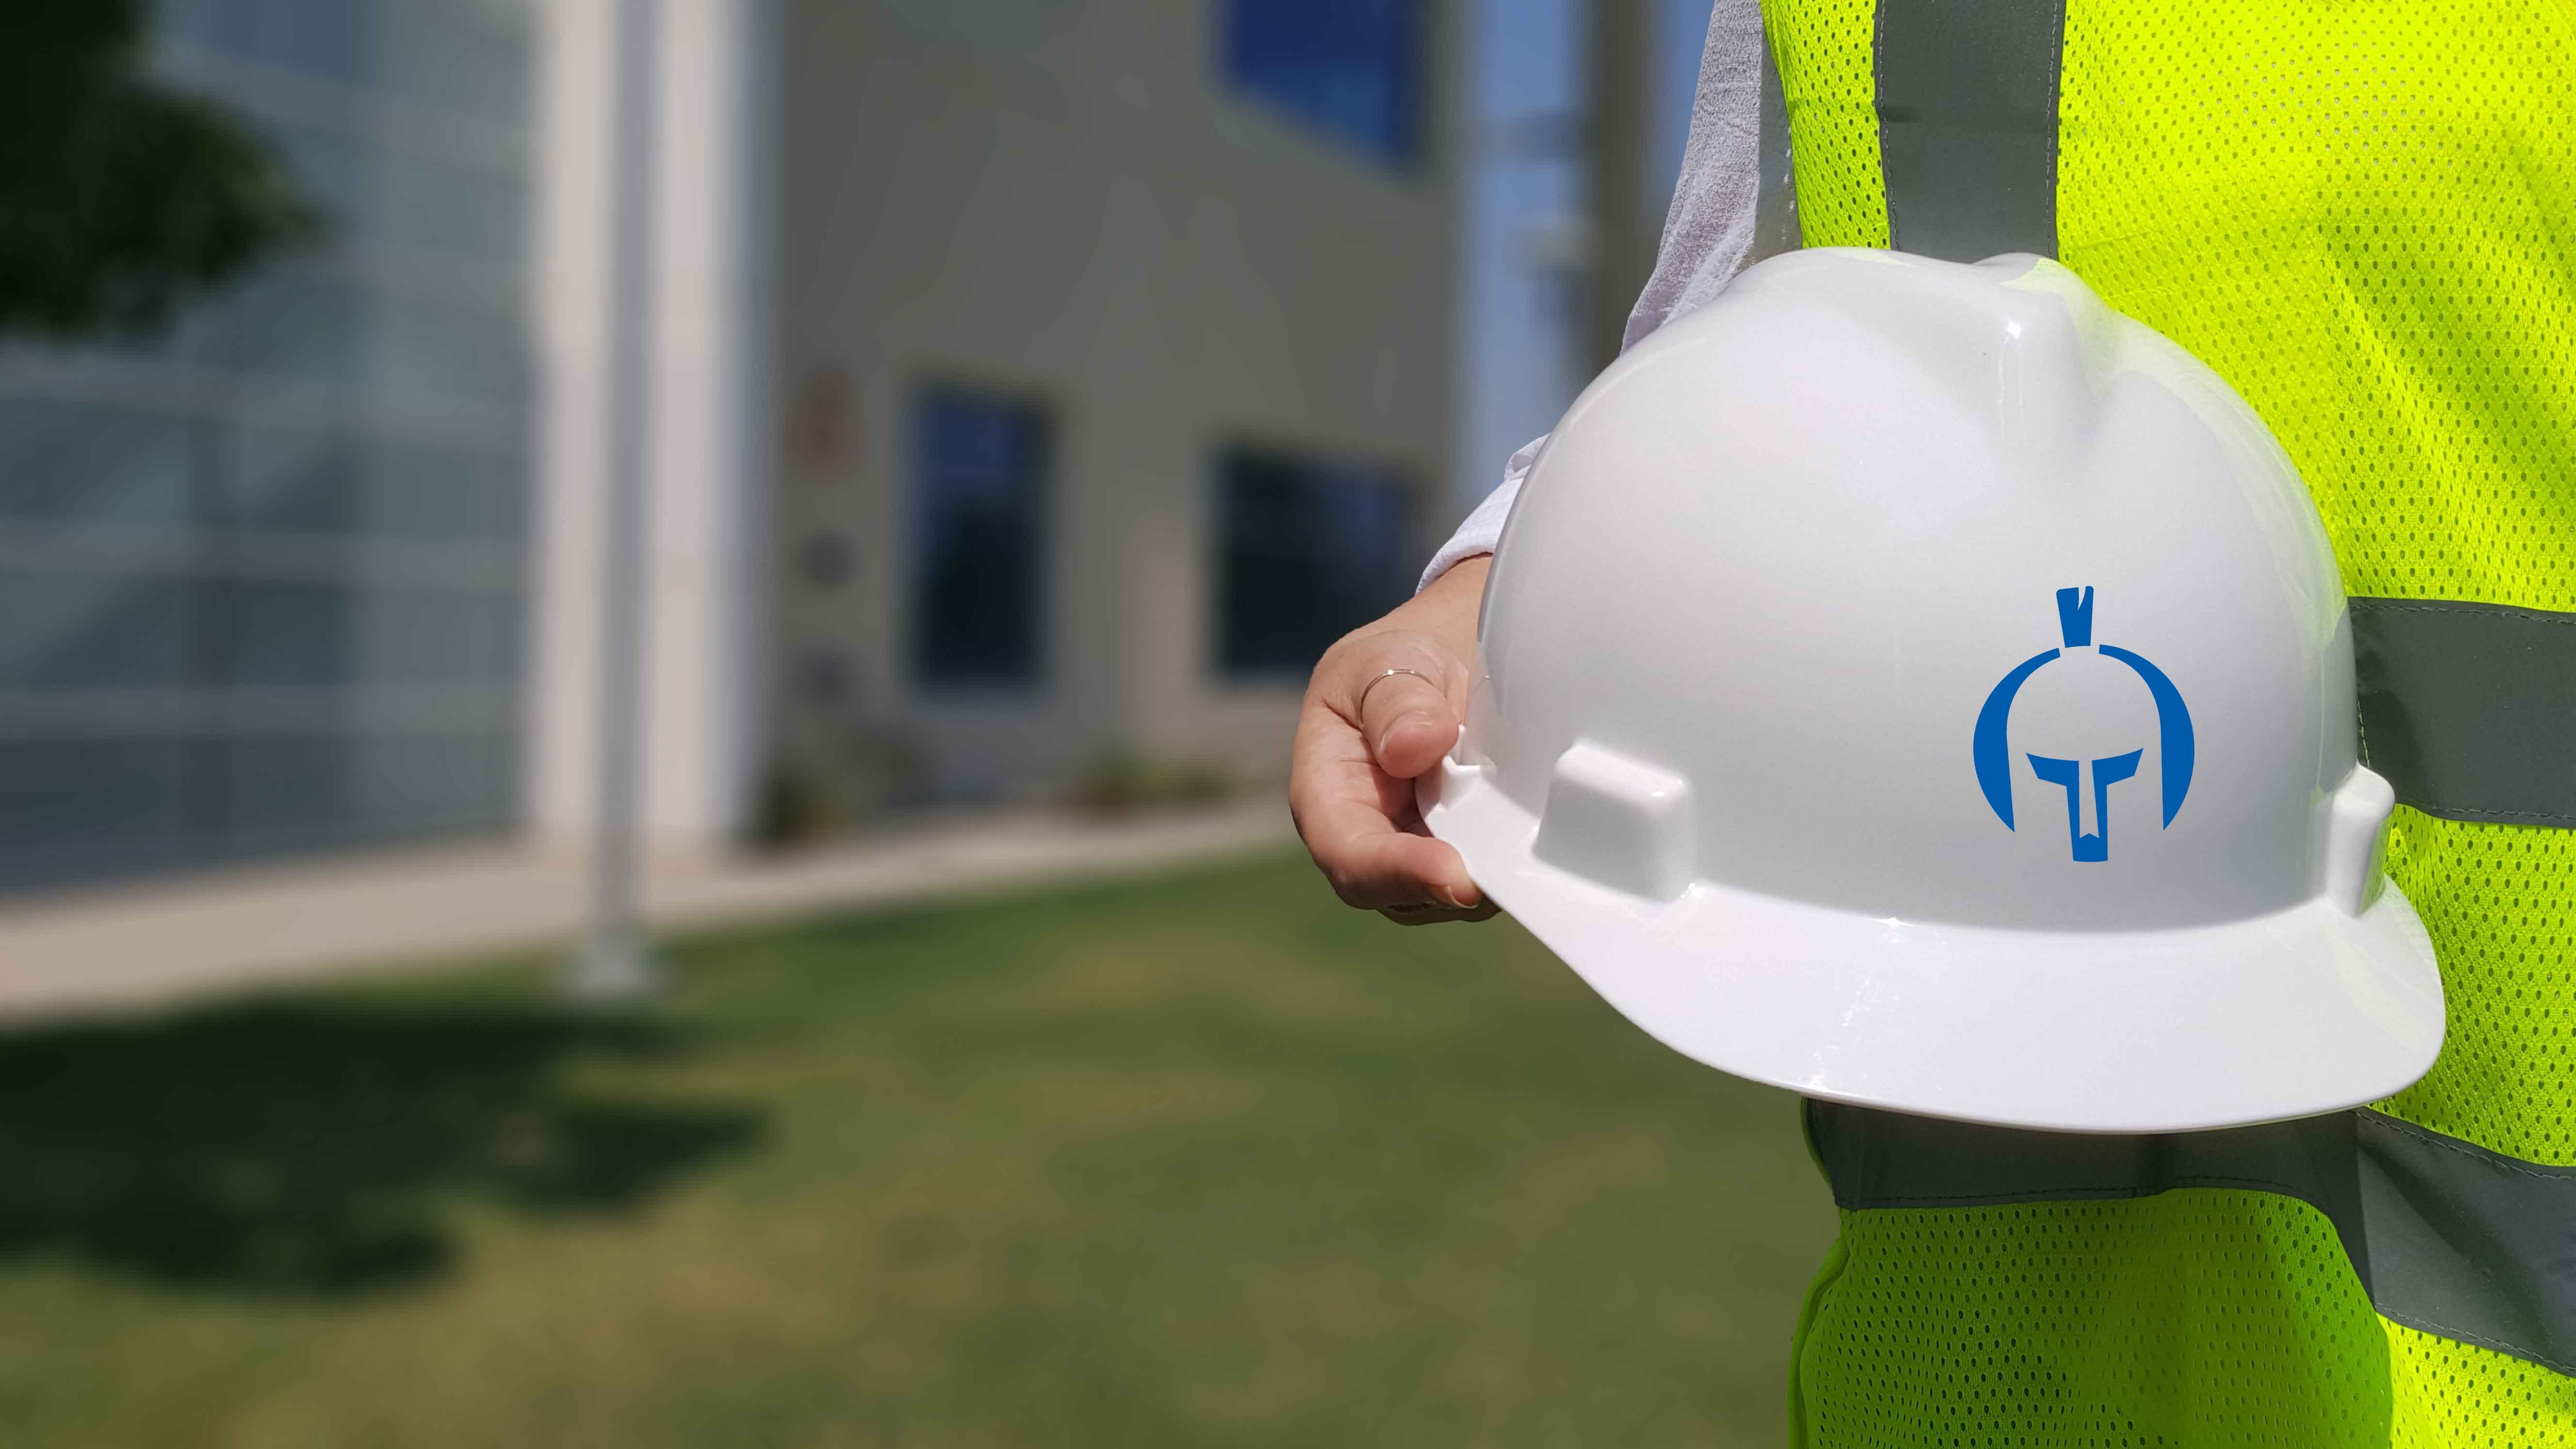 About Cratos Equipment, battery-powered construction equipment